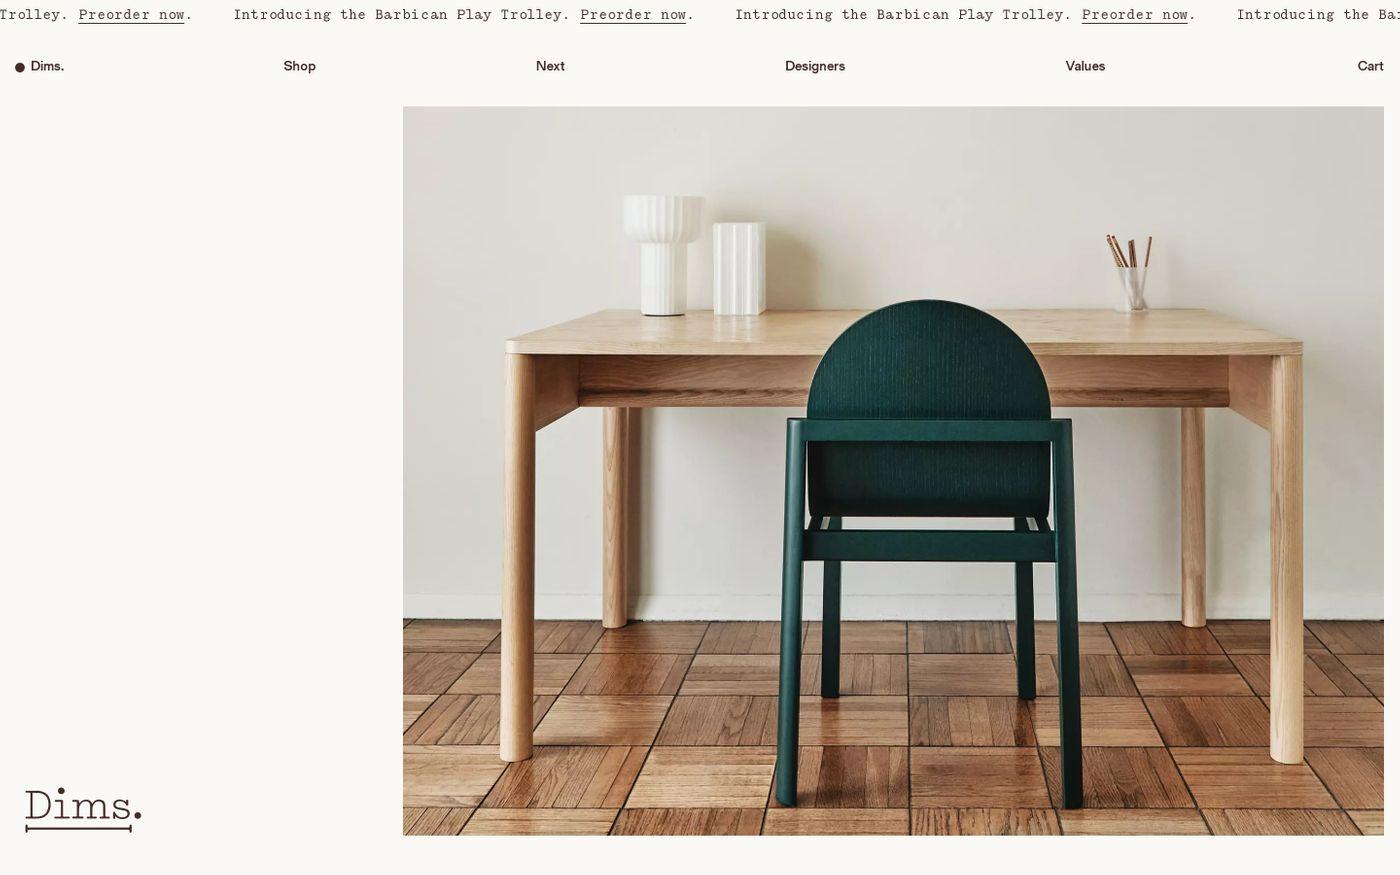 Screenshot of Dims. website